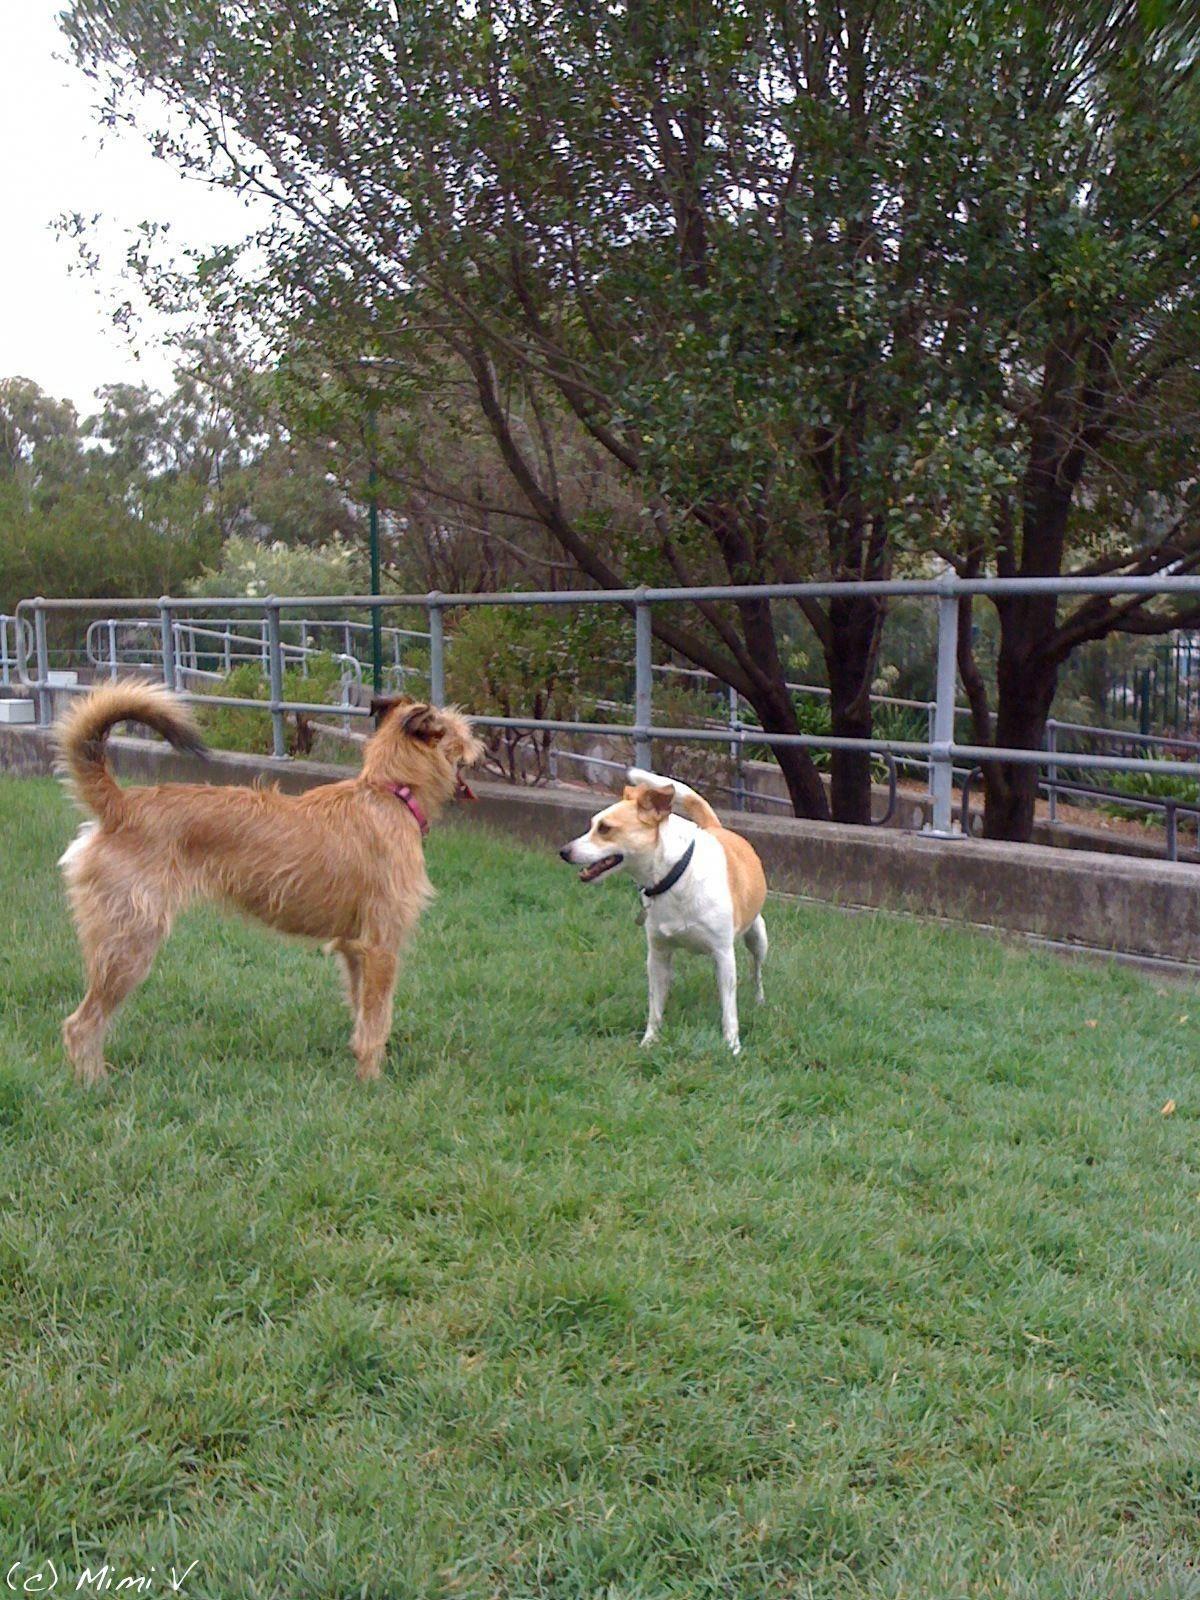 Cheap dog grooming near me luxurydogboarding code